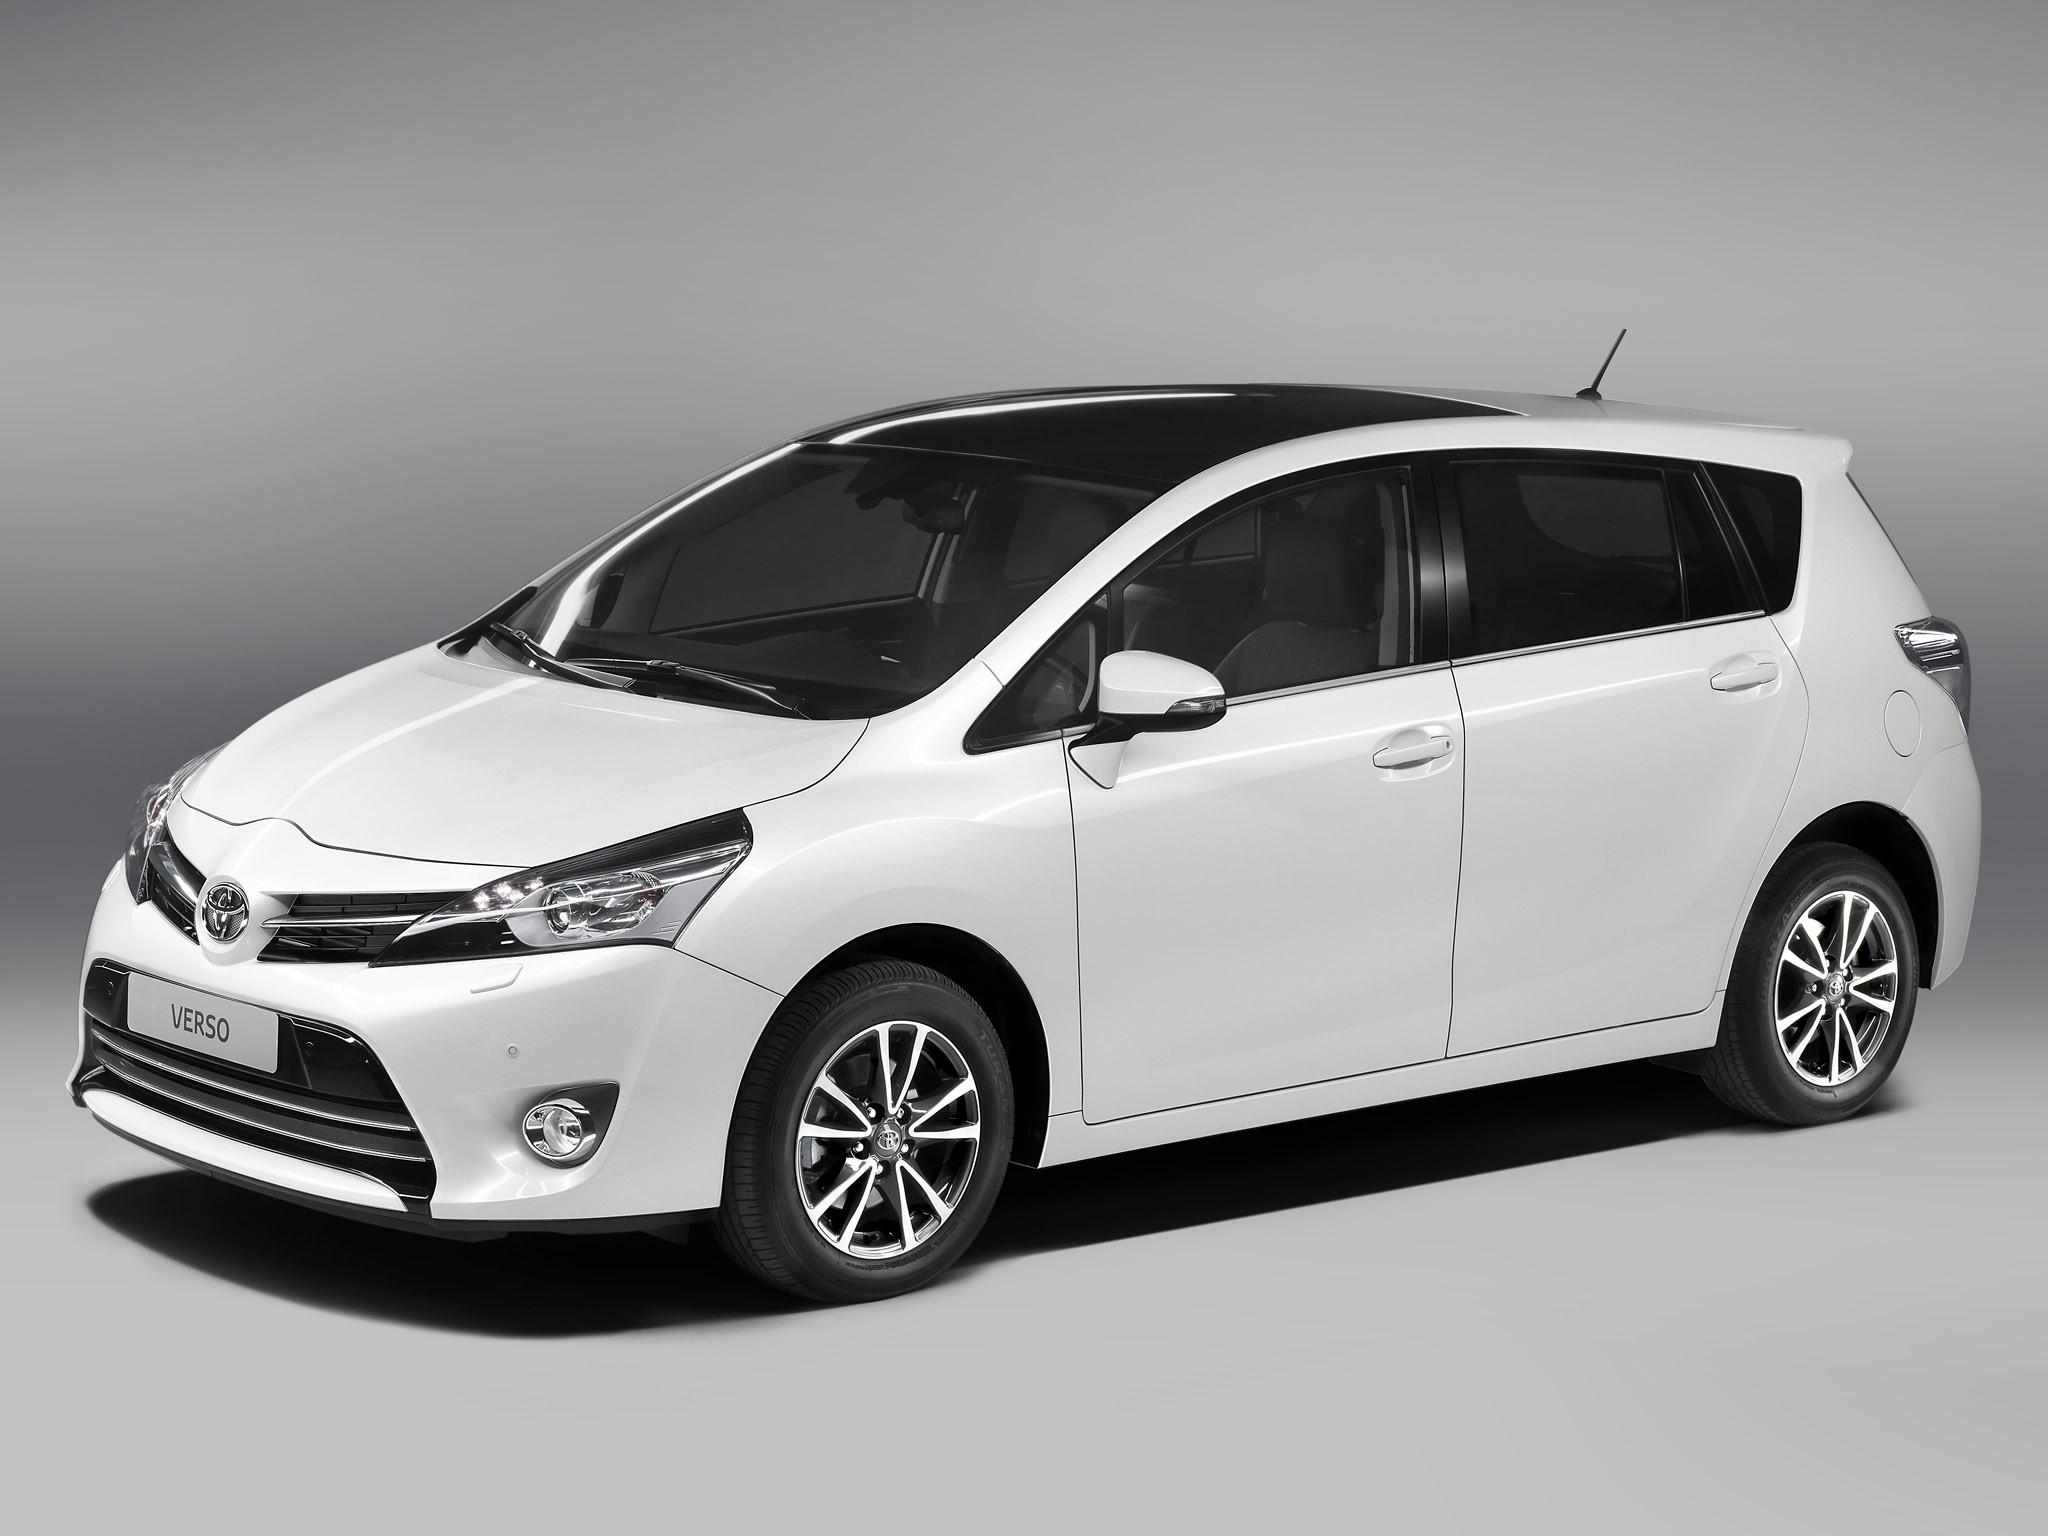 2013 Toyota Verso